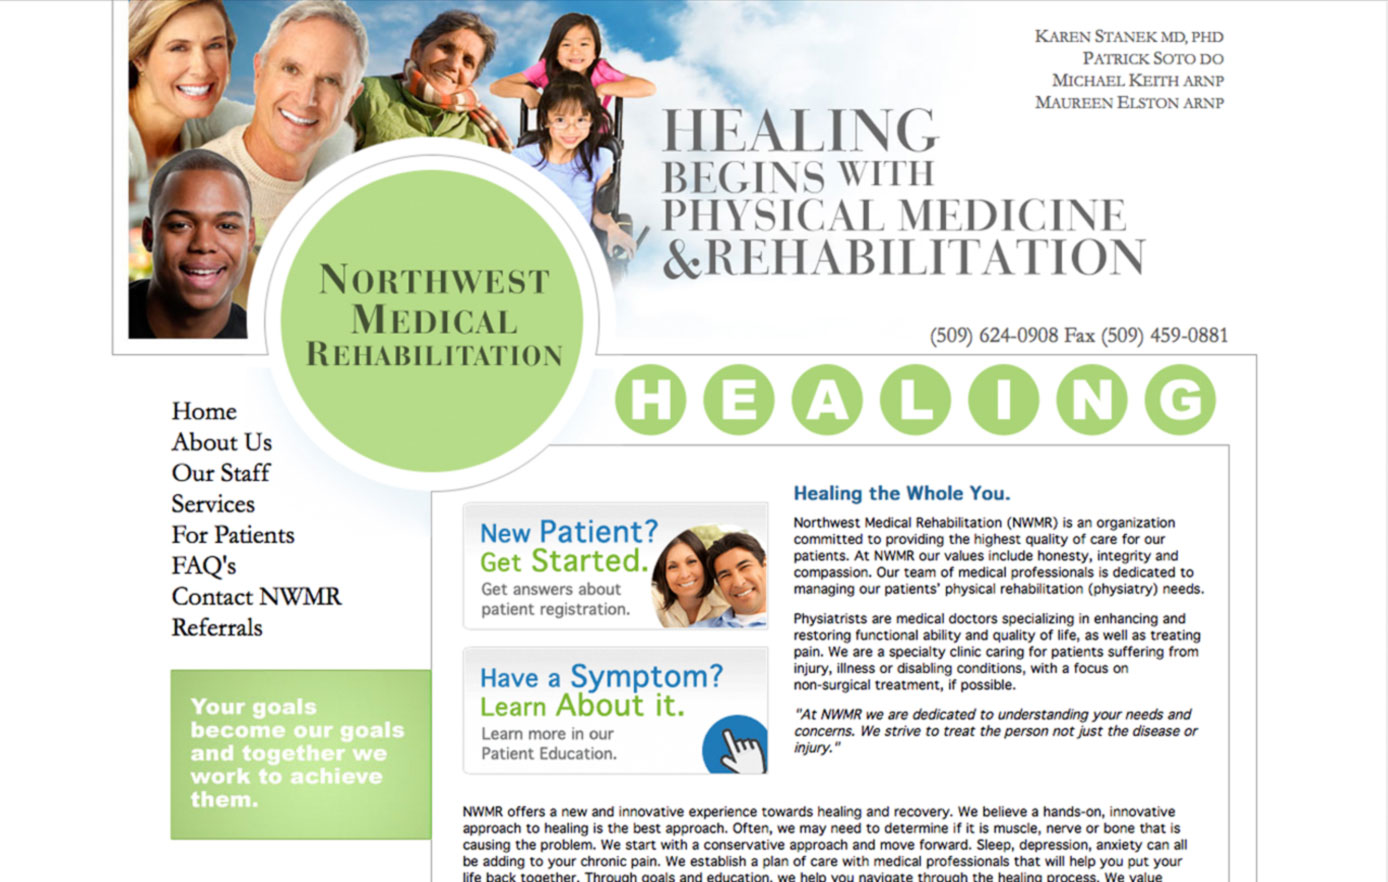 northwest medical rehabilitation, website design